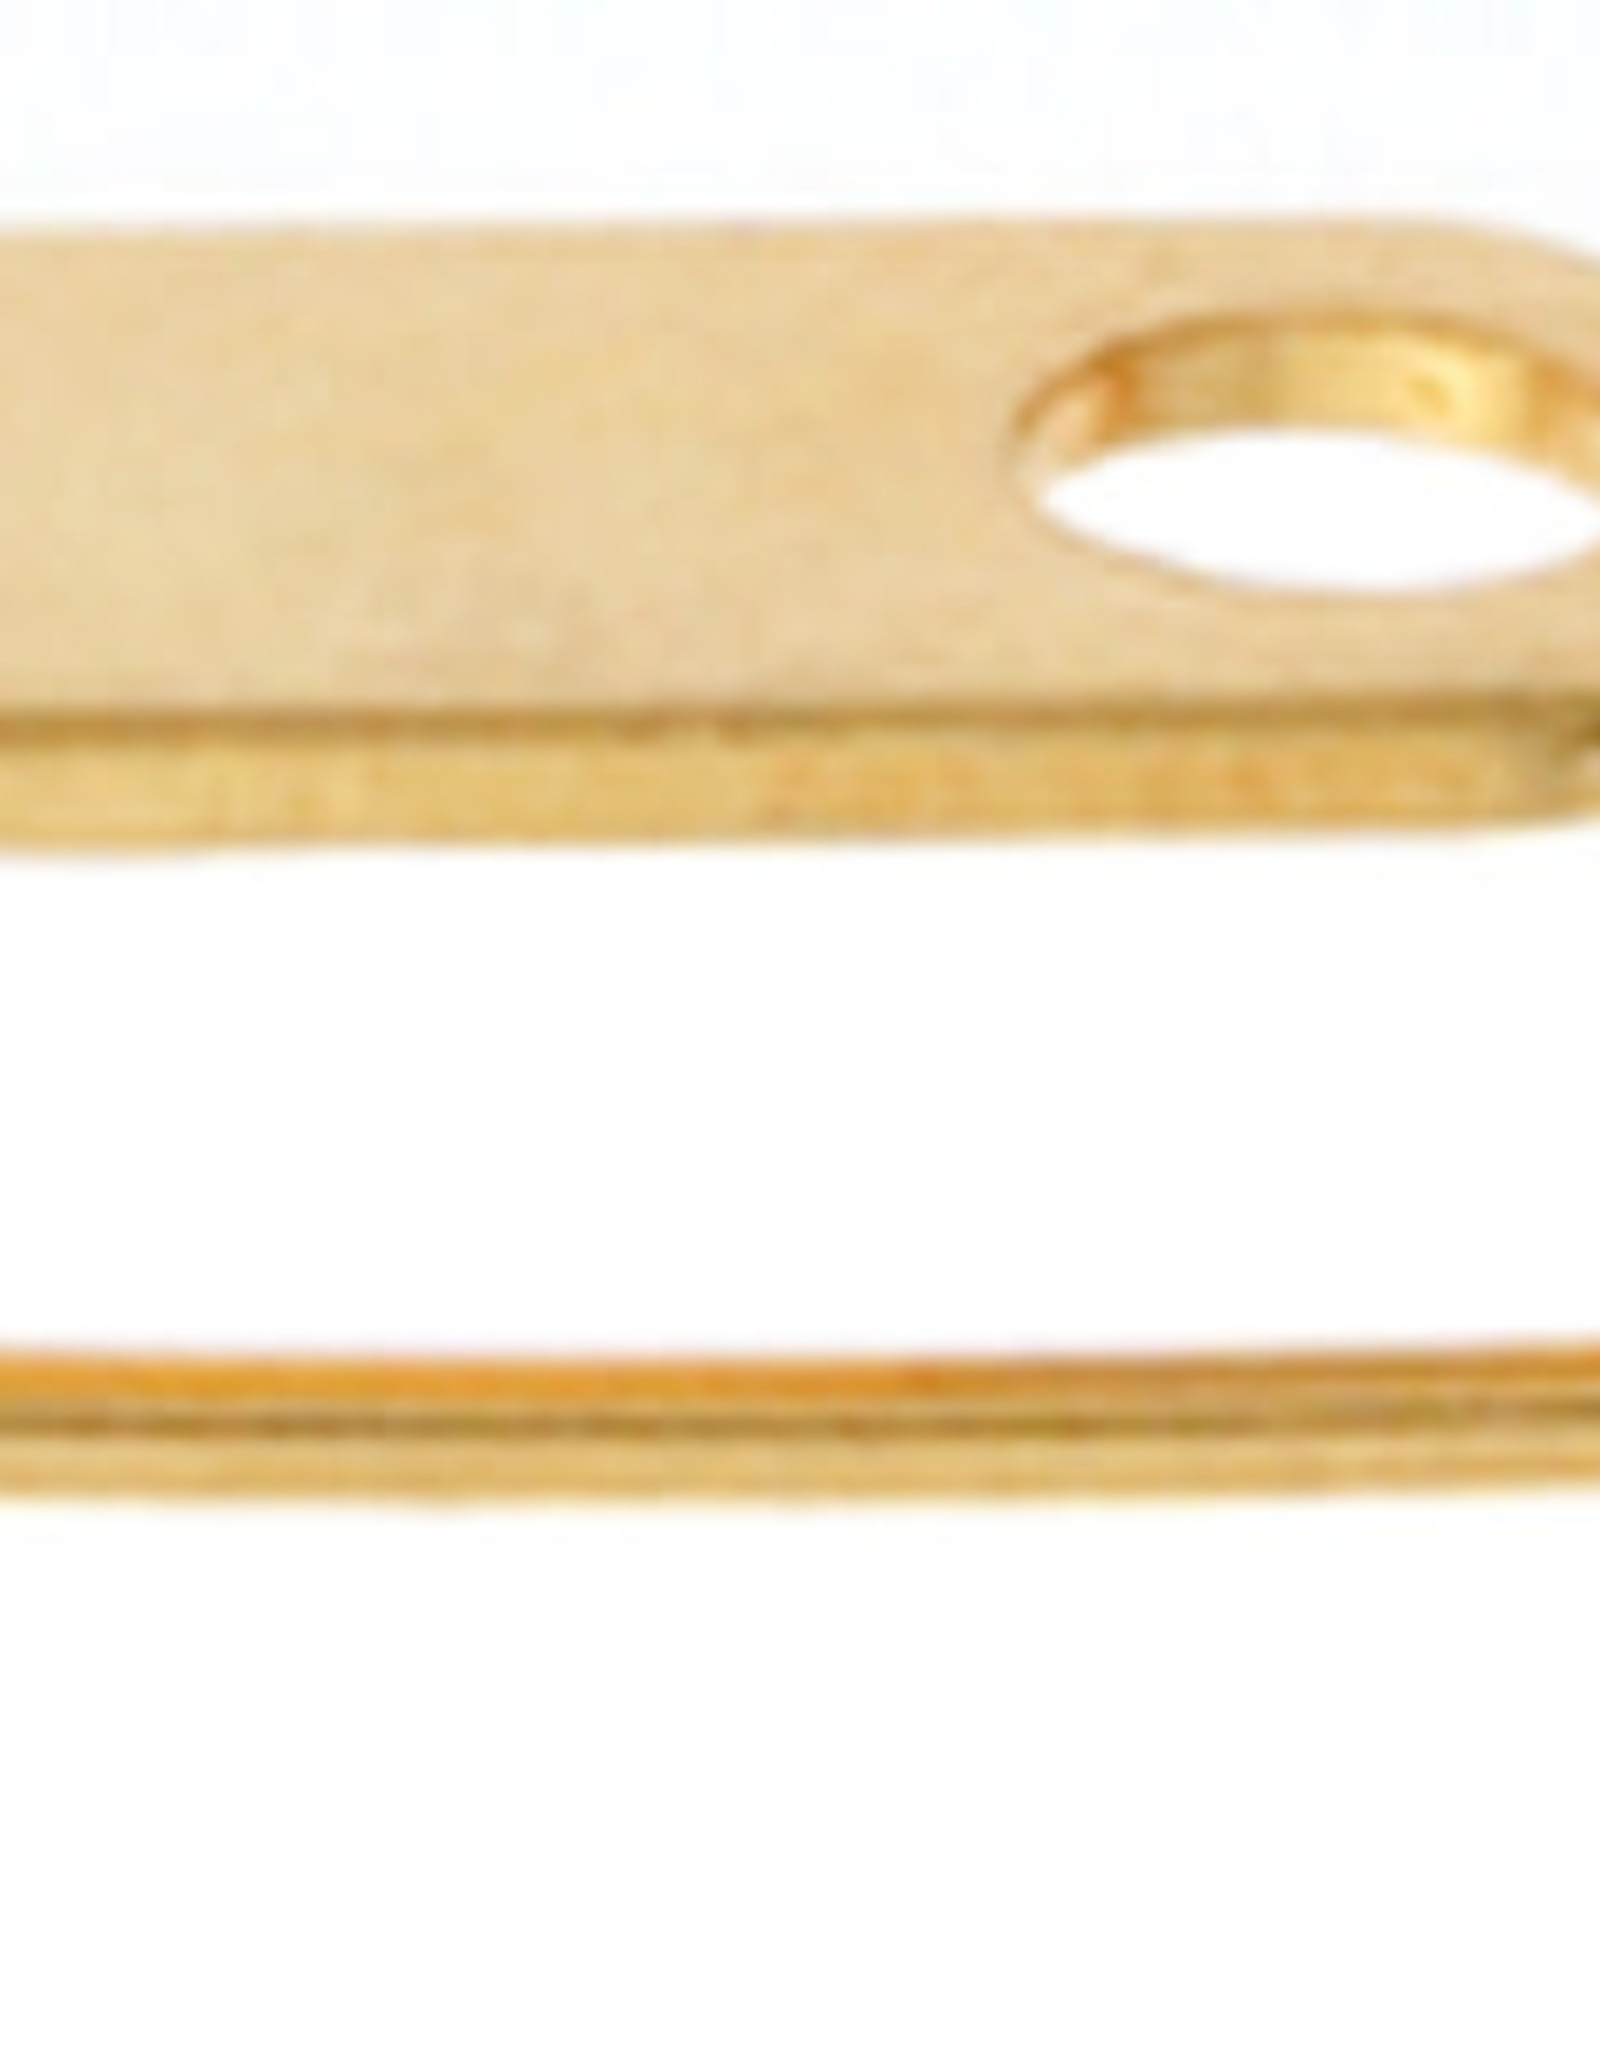 Broach Pins (Bar Pins) 0.75In Plated Gold(12 Pcs)